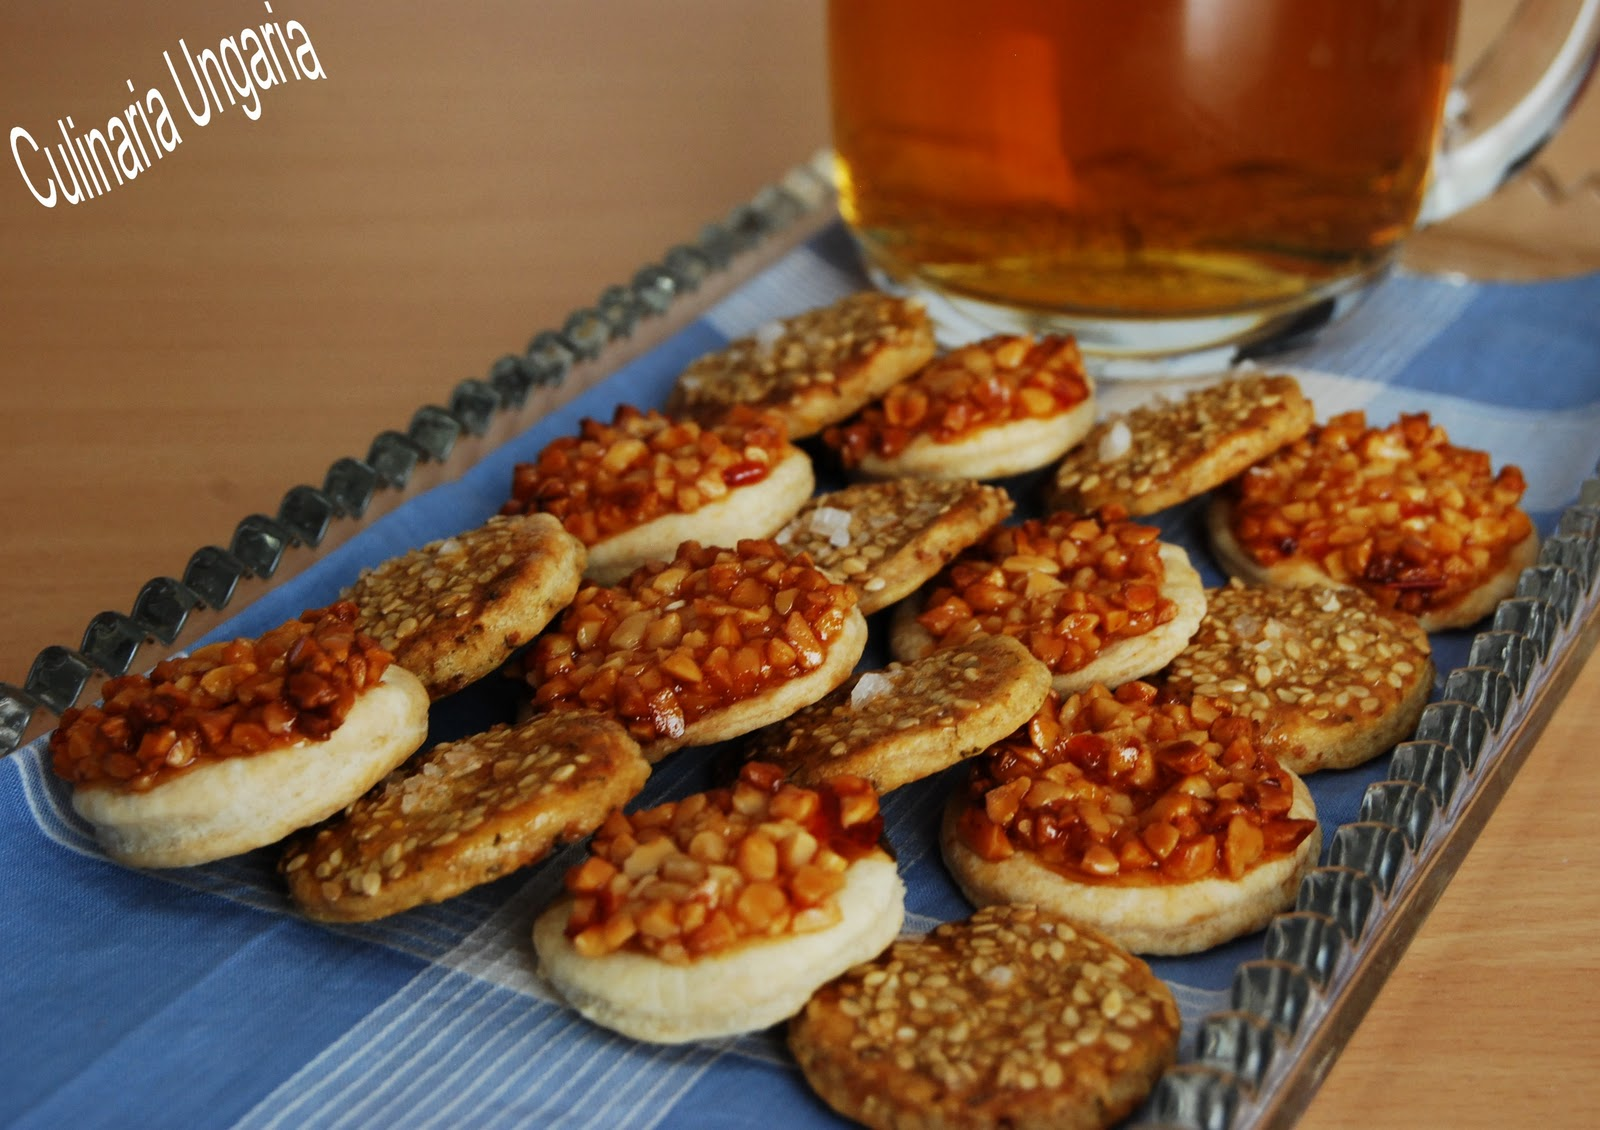 culinaria ungaria ein teig 50 kekse teil ii bier snacks. Black Bedroom Furniture Sets. Home Design Ideas